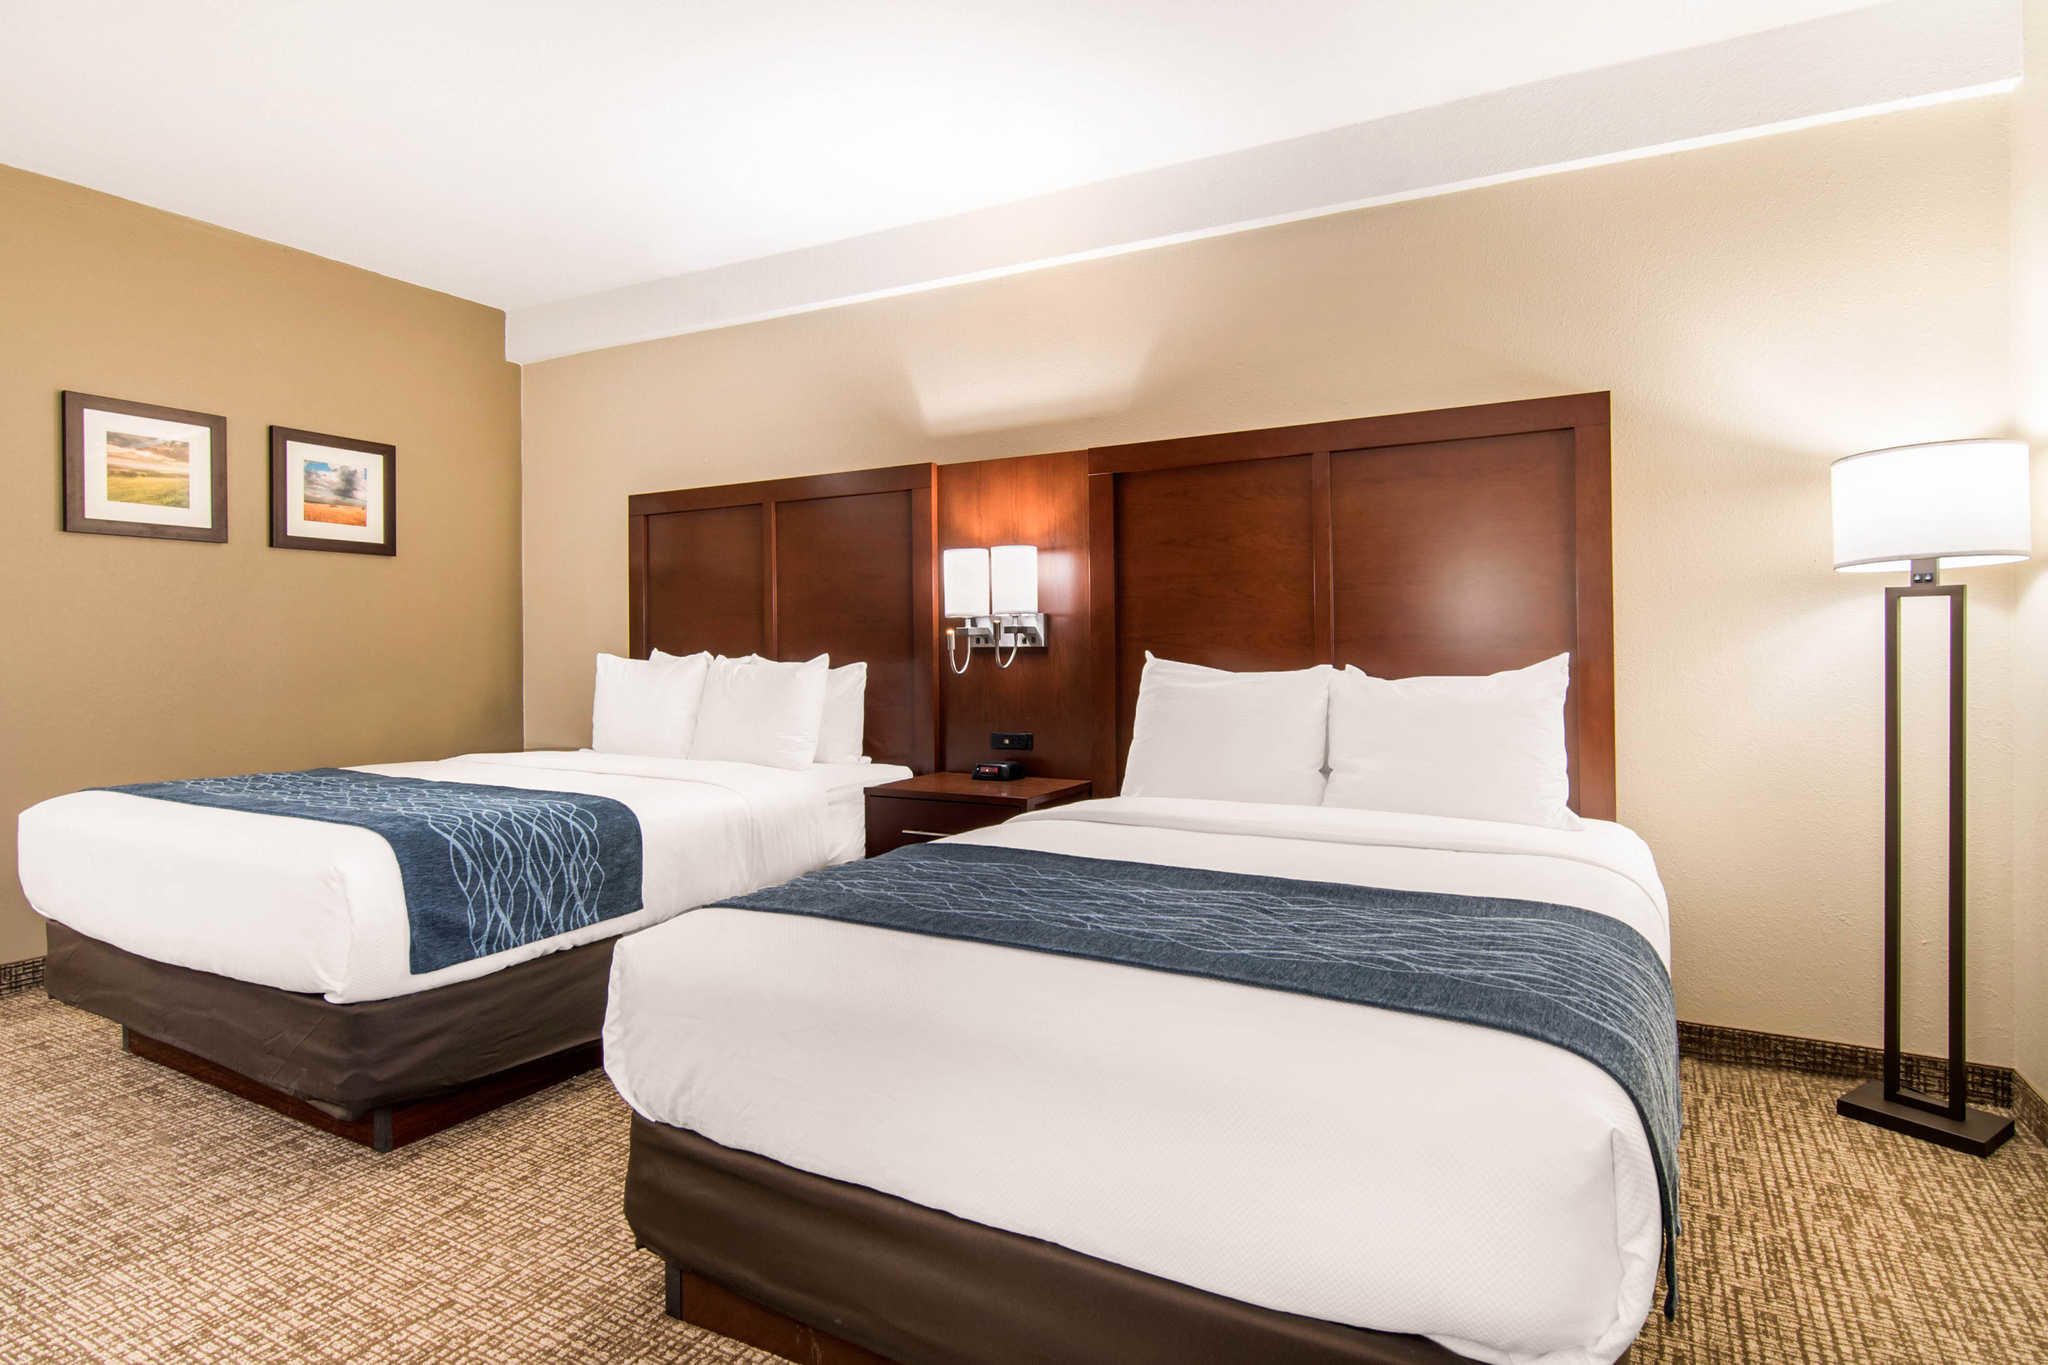 Comfort Inn & Suites Junction City - near Fort Riley image 24